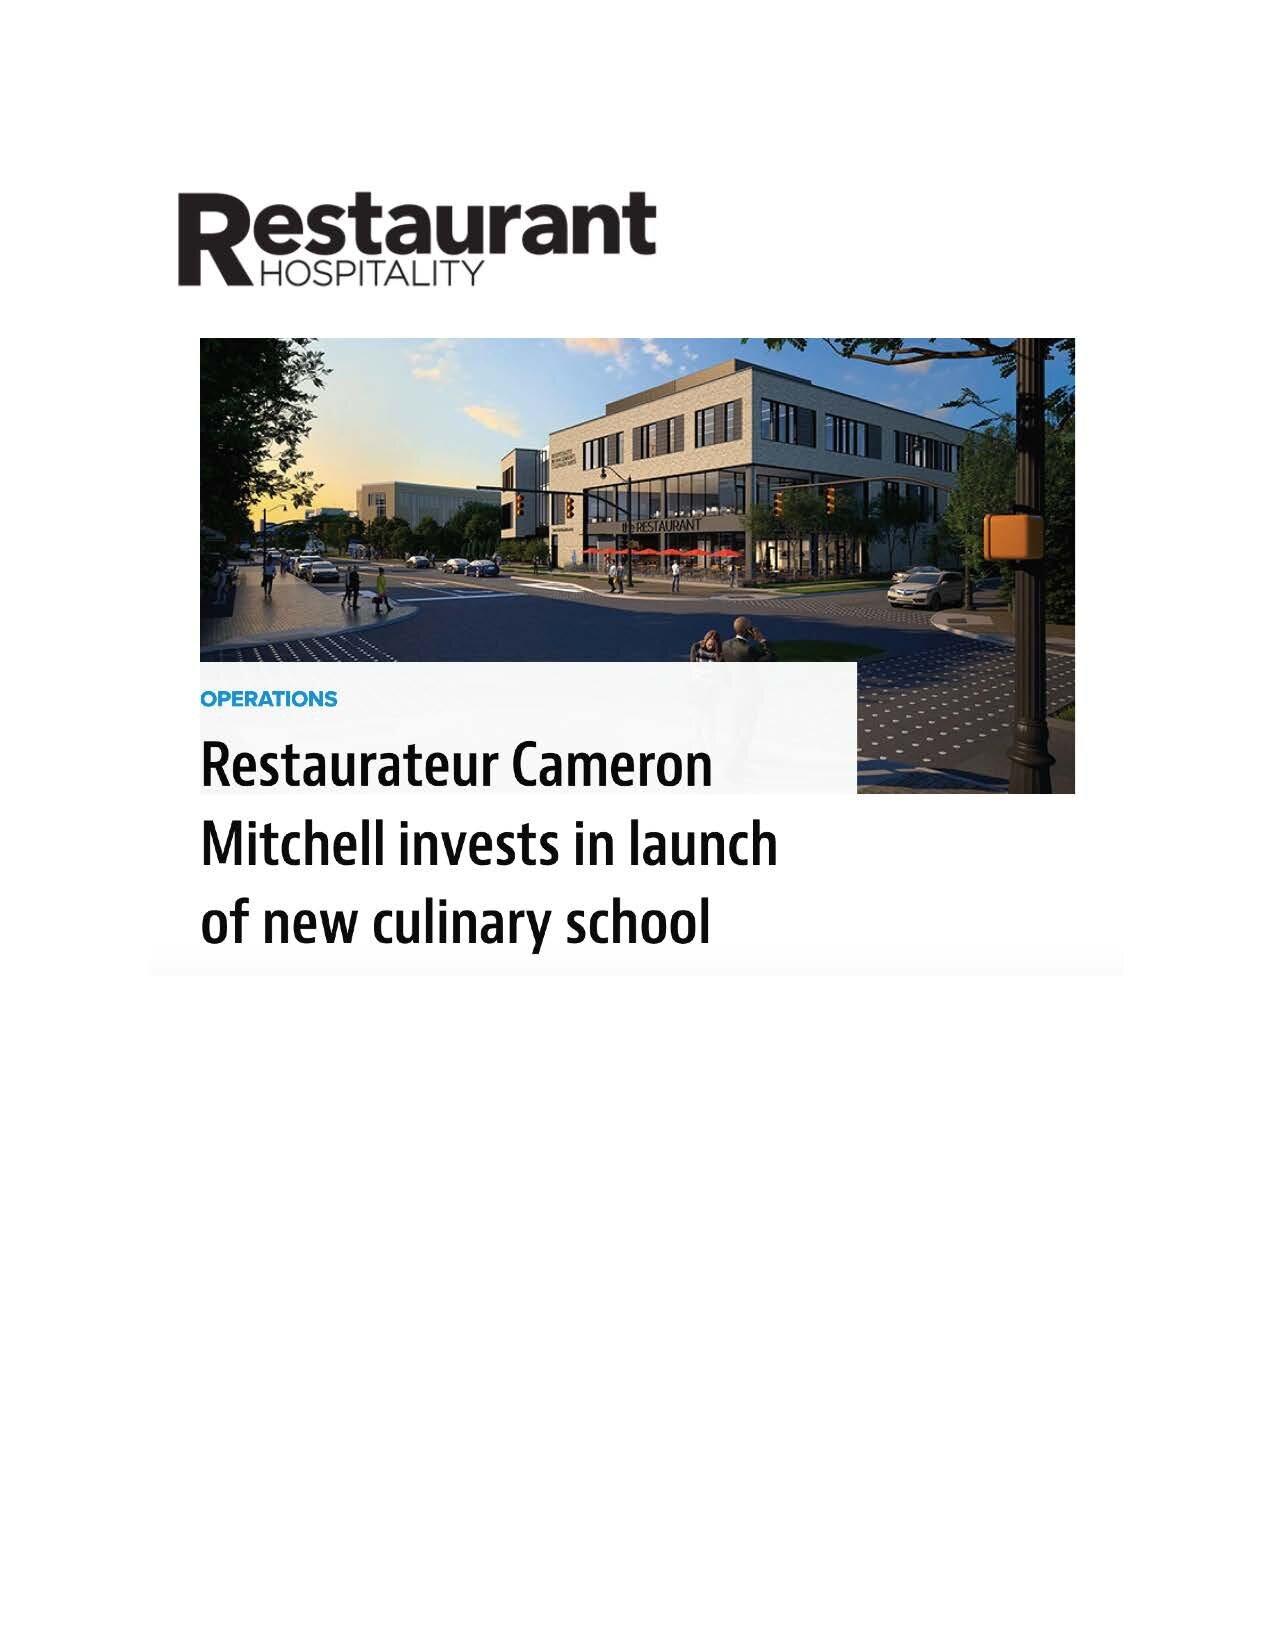 Juy 2019 Restaurant Hospitality_Page_1.jpg